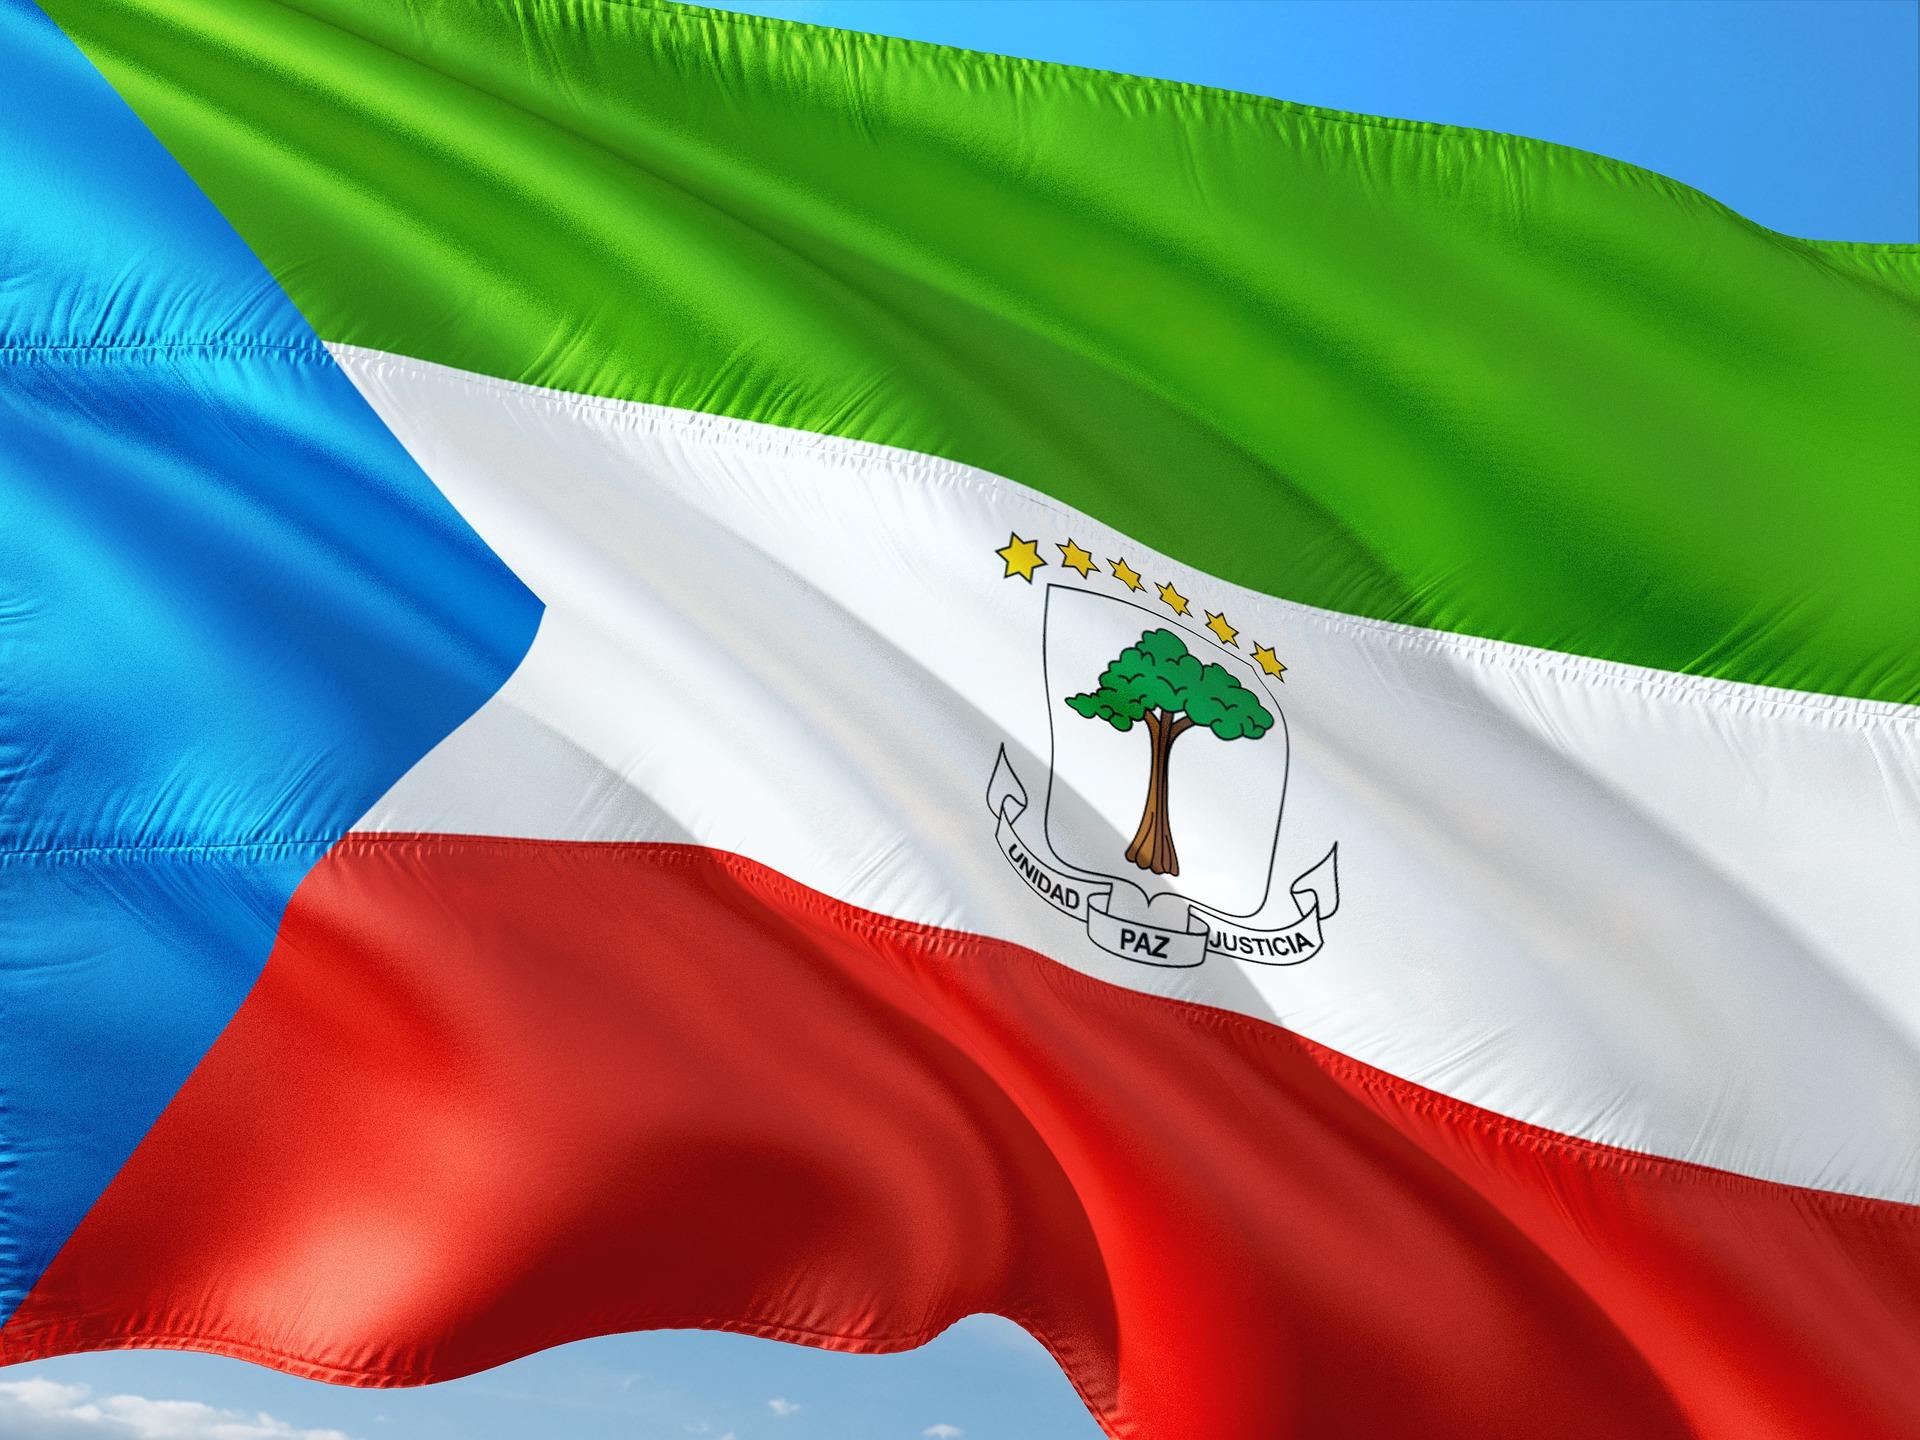 107 killed in Equatorial Guinea explosion